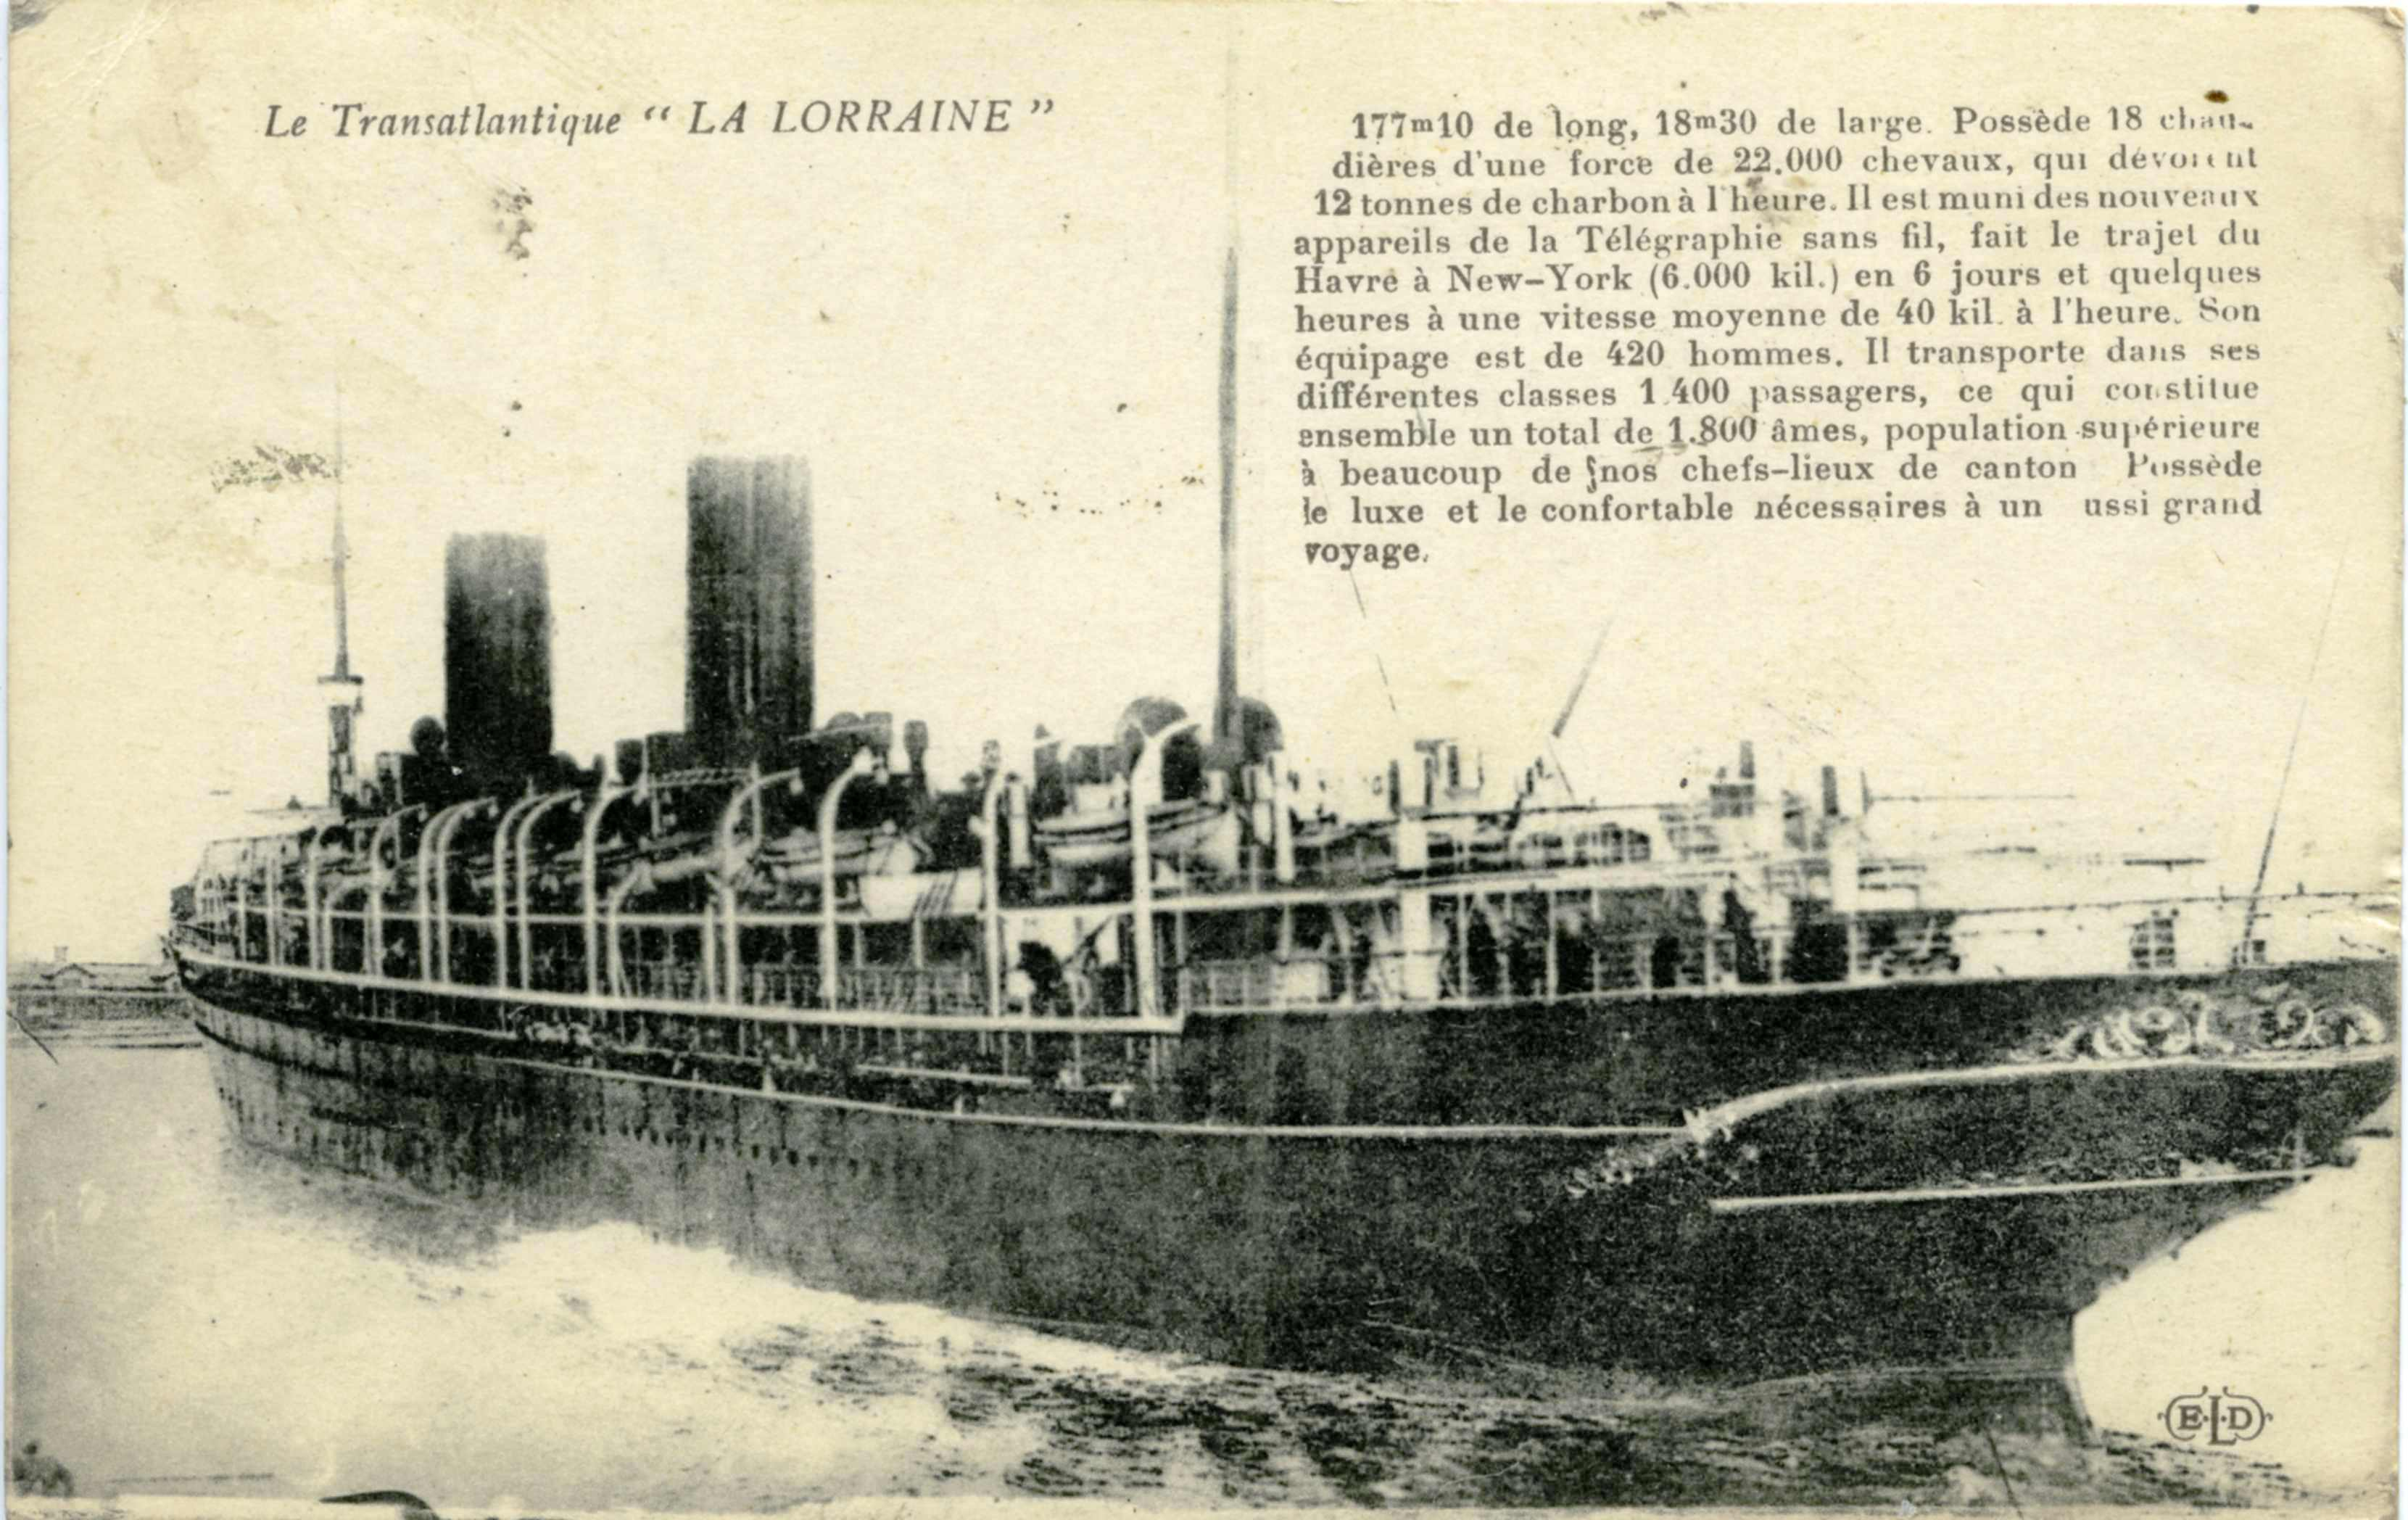 1919-1-Transat La Lorraine-009 Corrigee.jpg